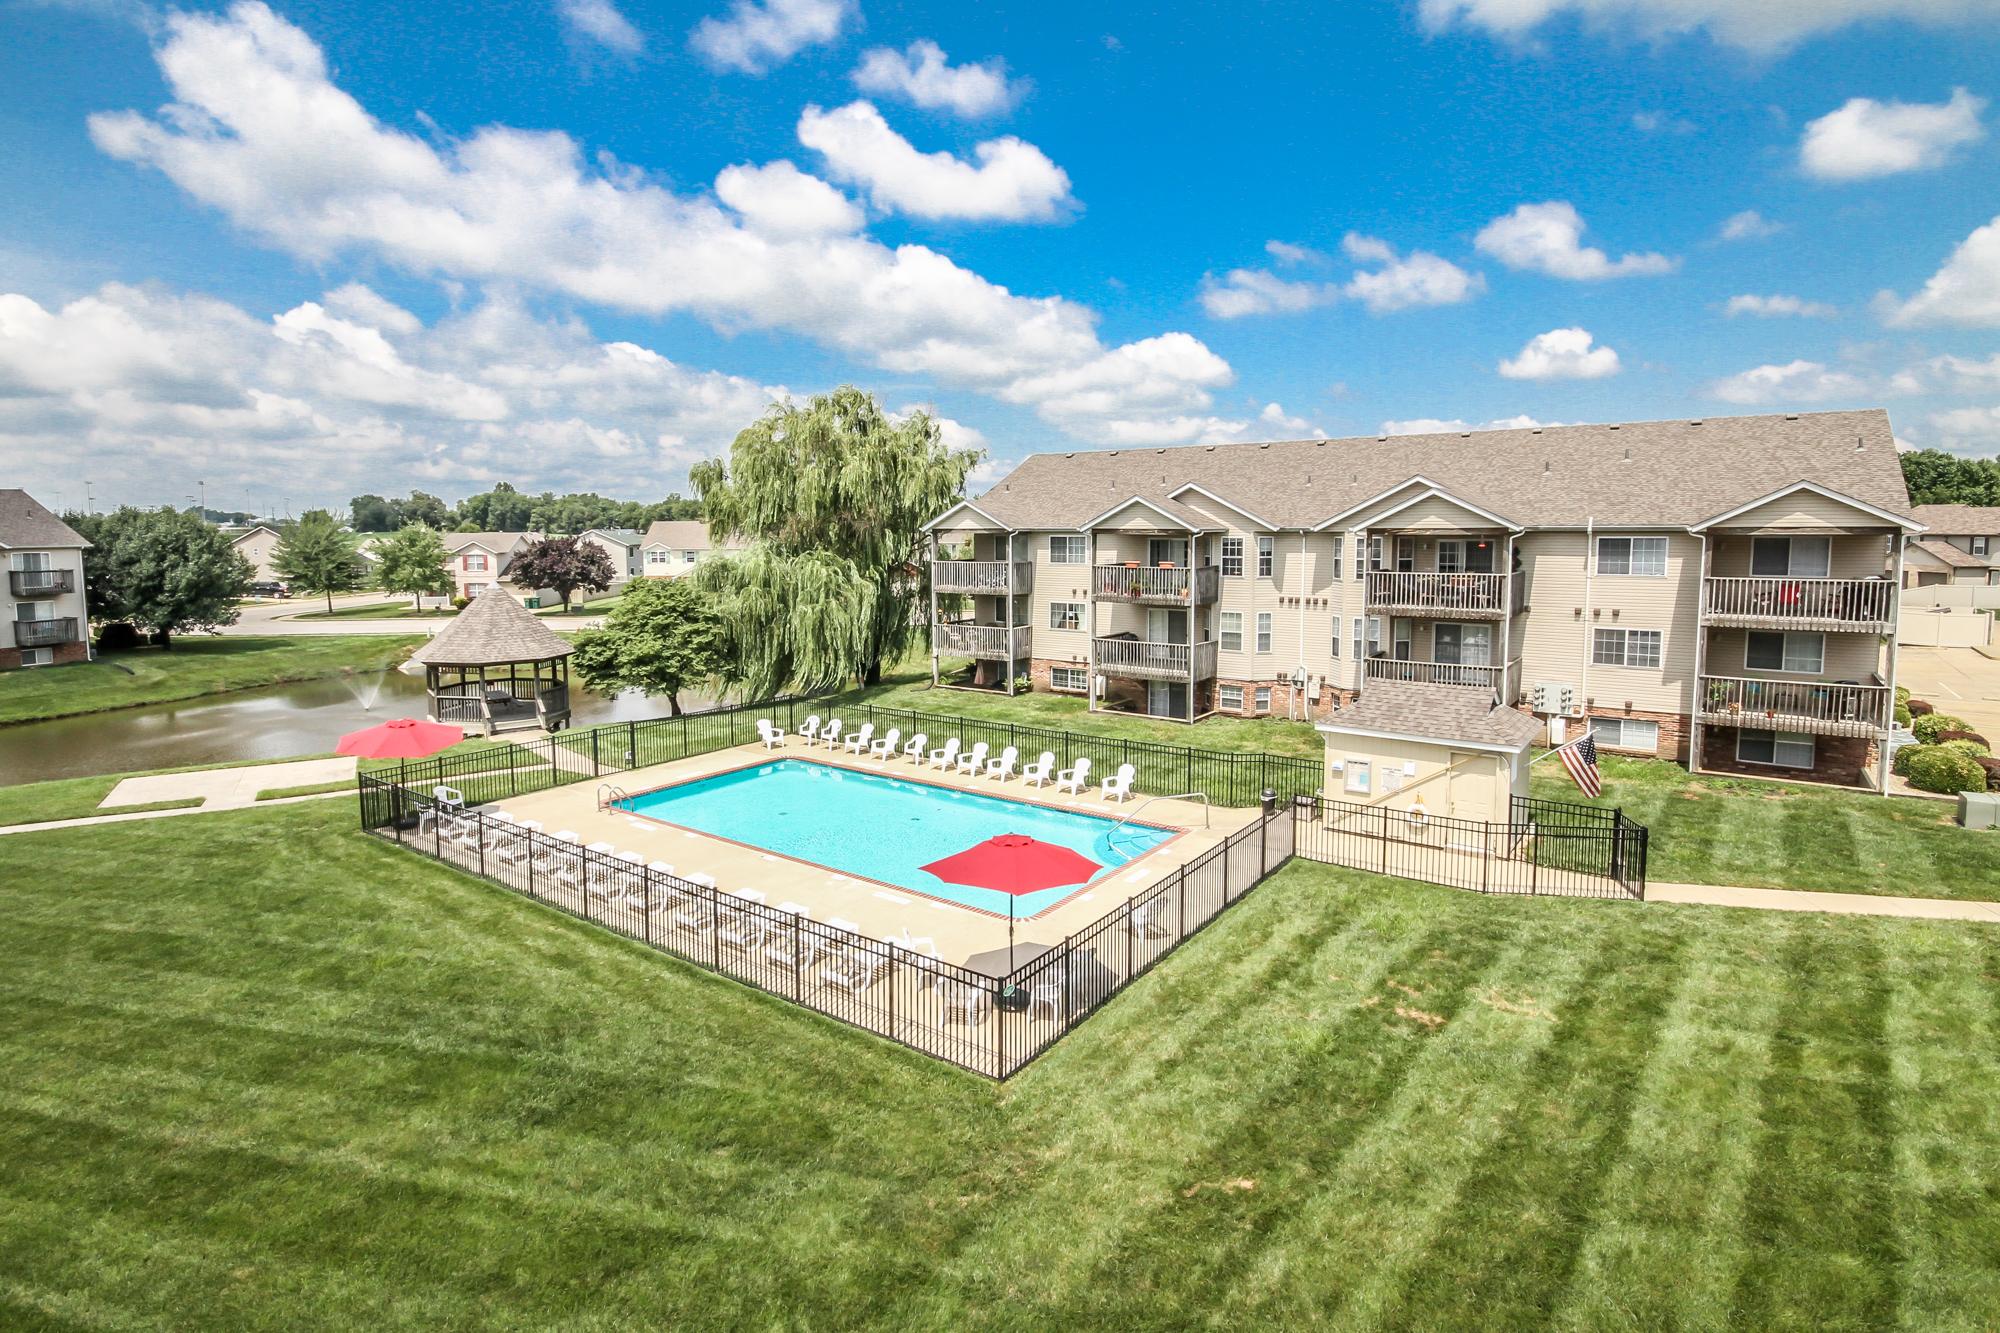 Brookside-Apartments-O'Fallon-Illinois-Pool-1.jpg